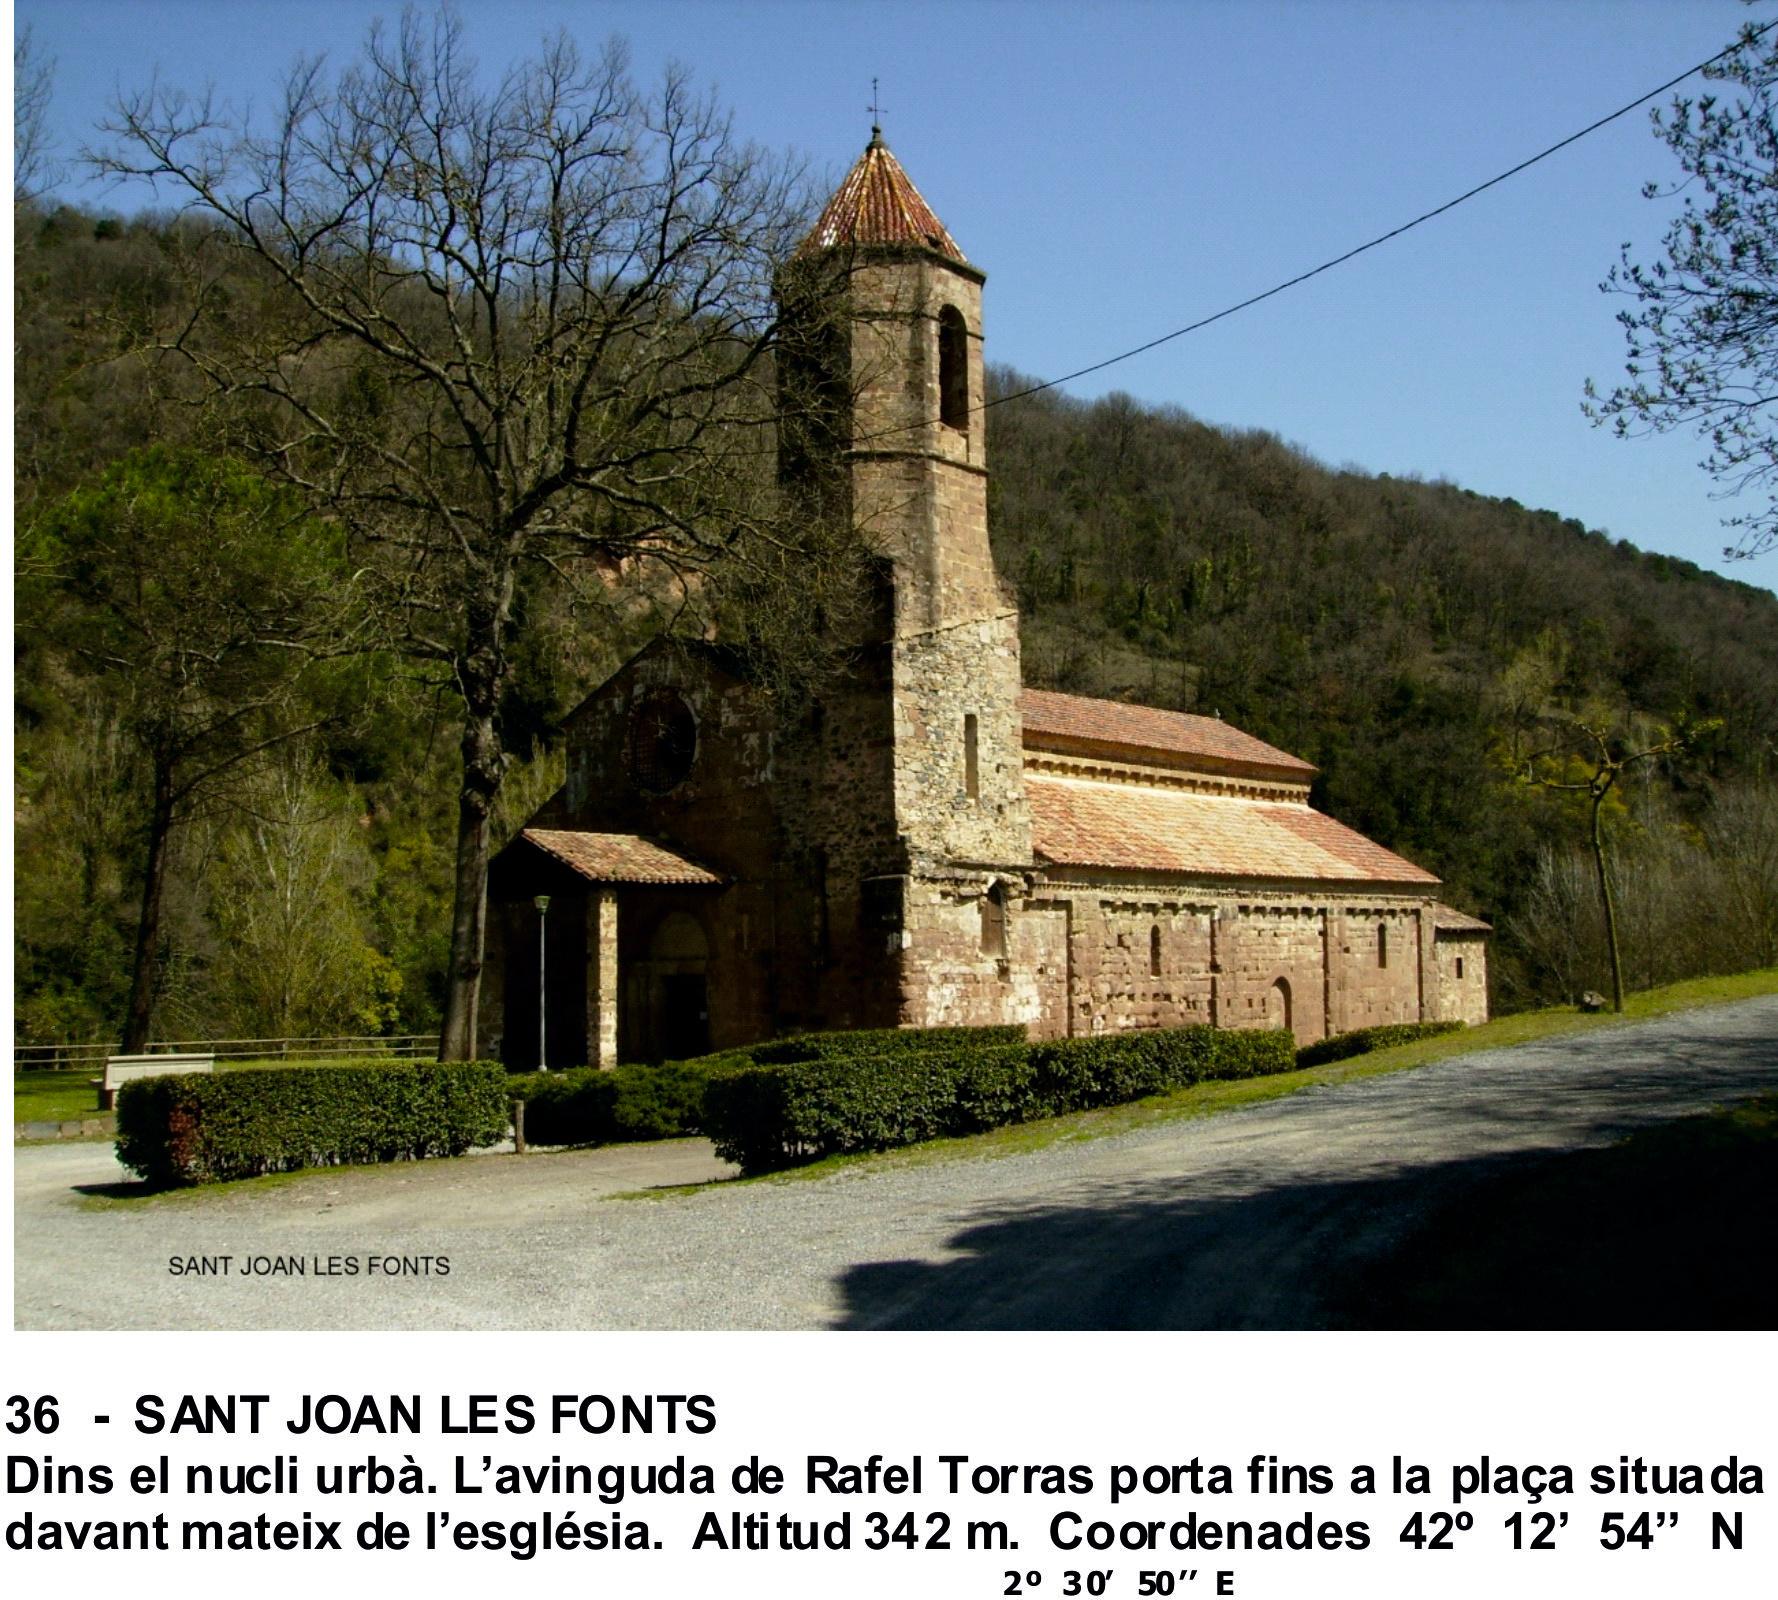 36  -  SANT JOAN LES FONTS